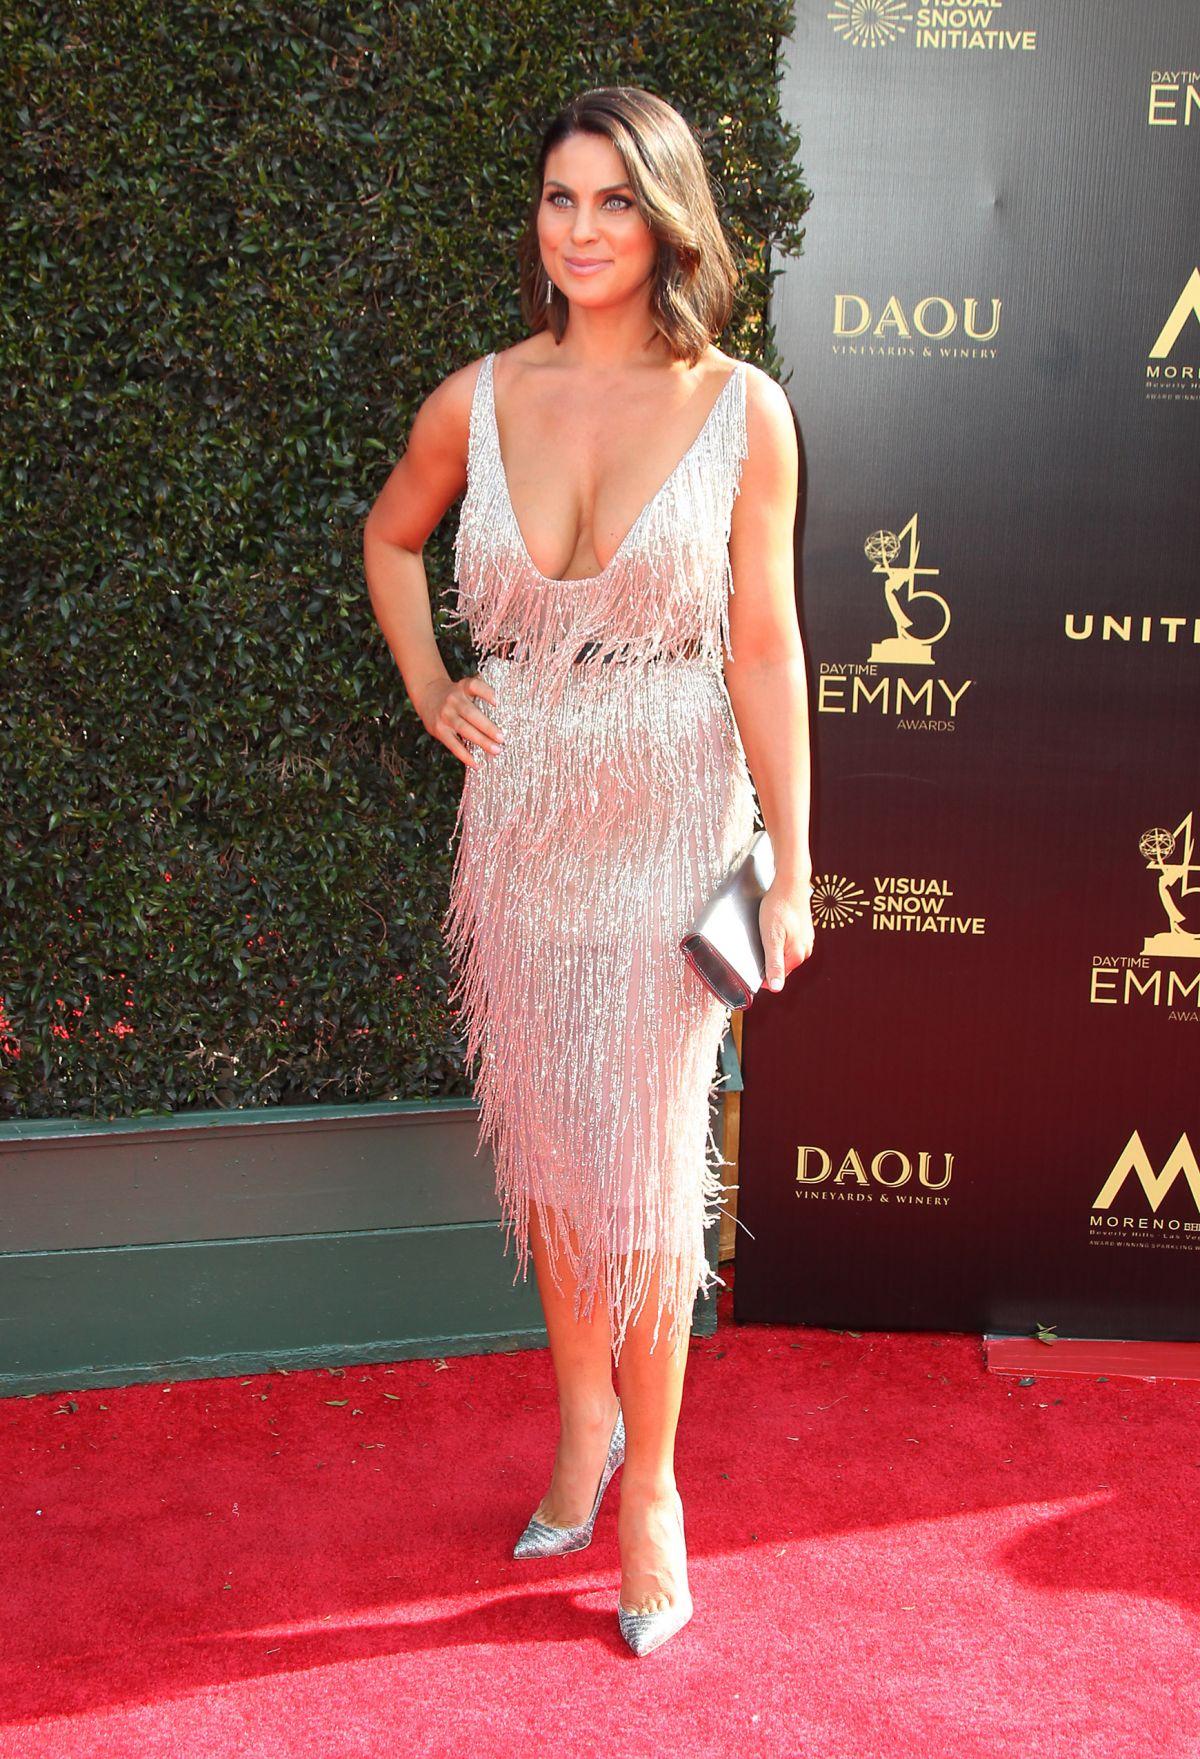 NADIA BJORLIN at Daytime Emmy Awards 2018 in Los Angeles ... Emmy Awards 2018